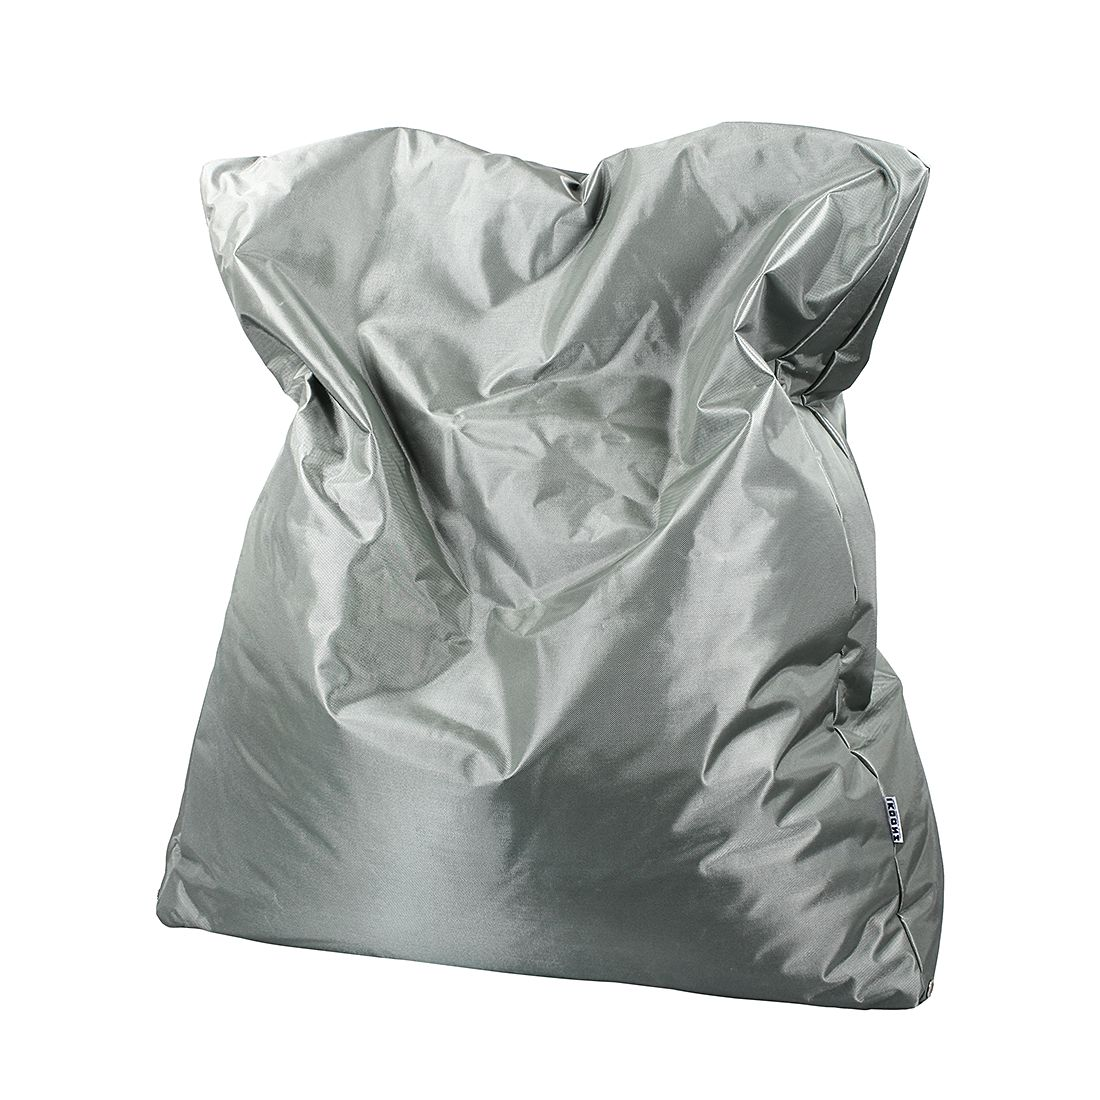 Sitzsack T-Bag Outdoor – Silber, Ikoonz günstig bestellen